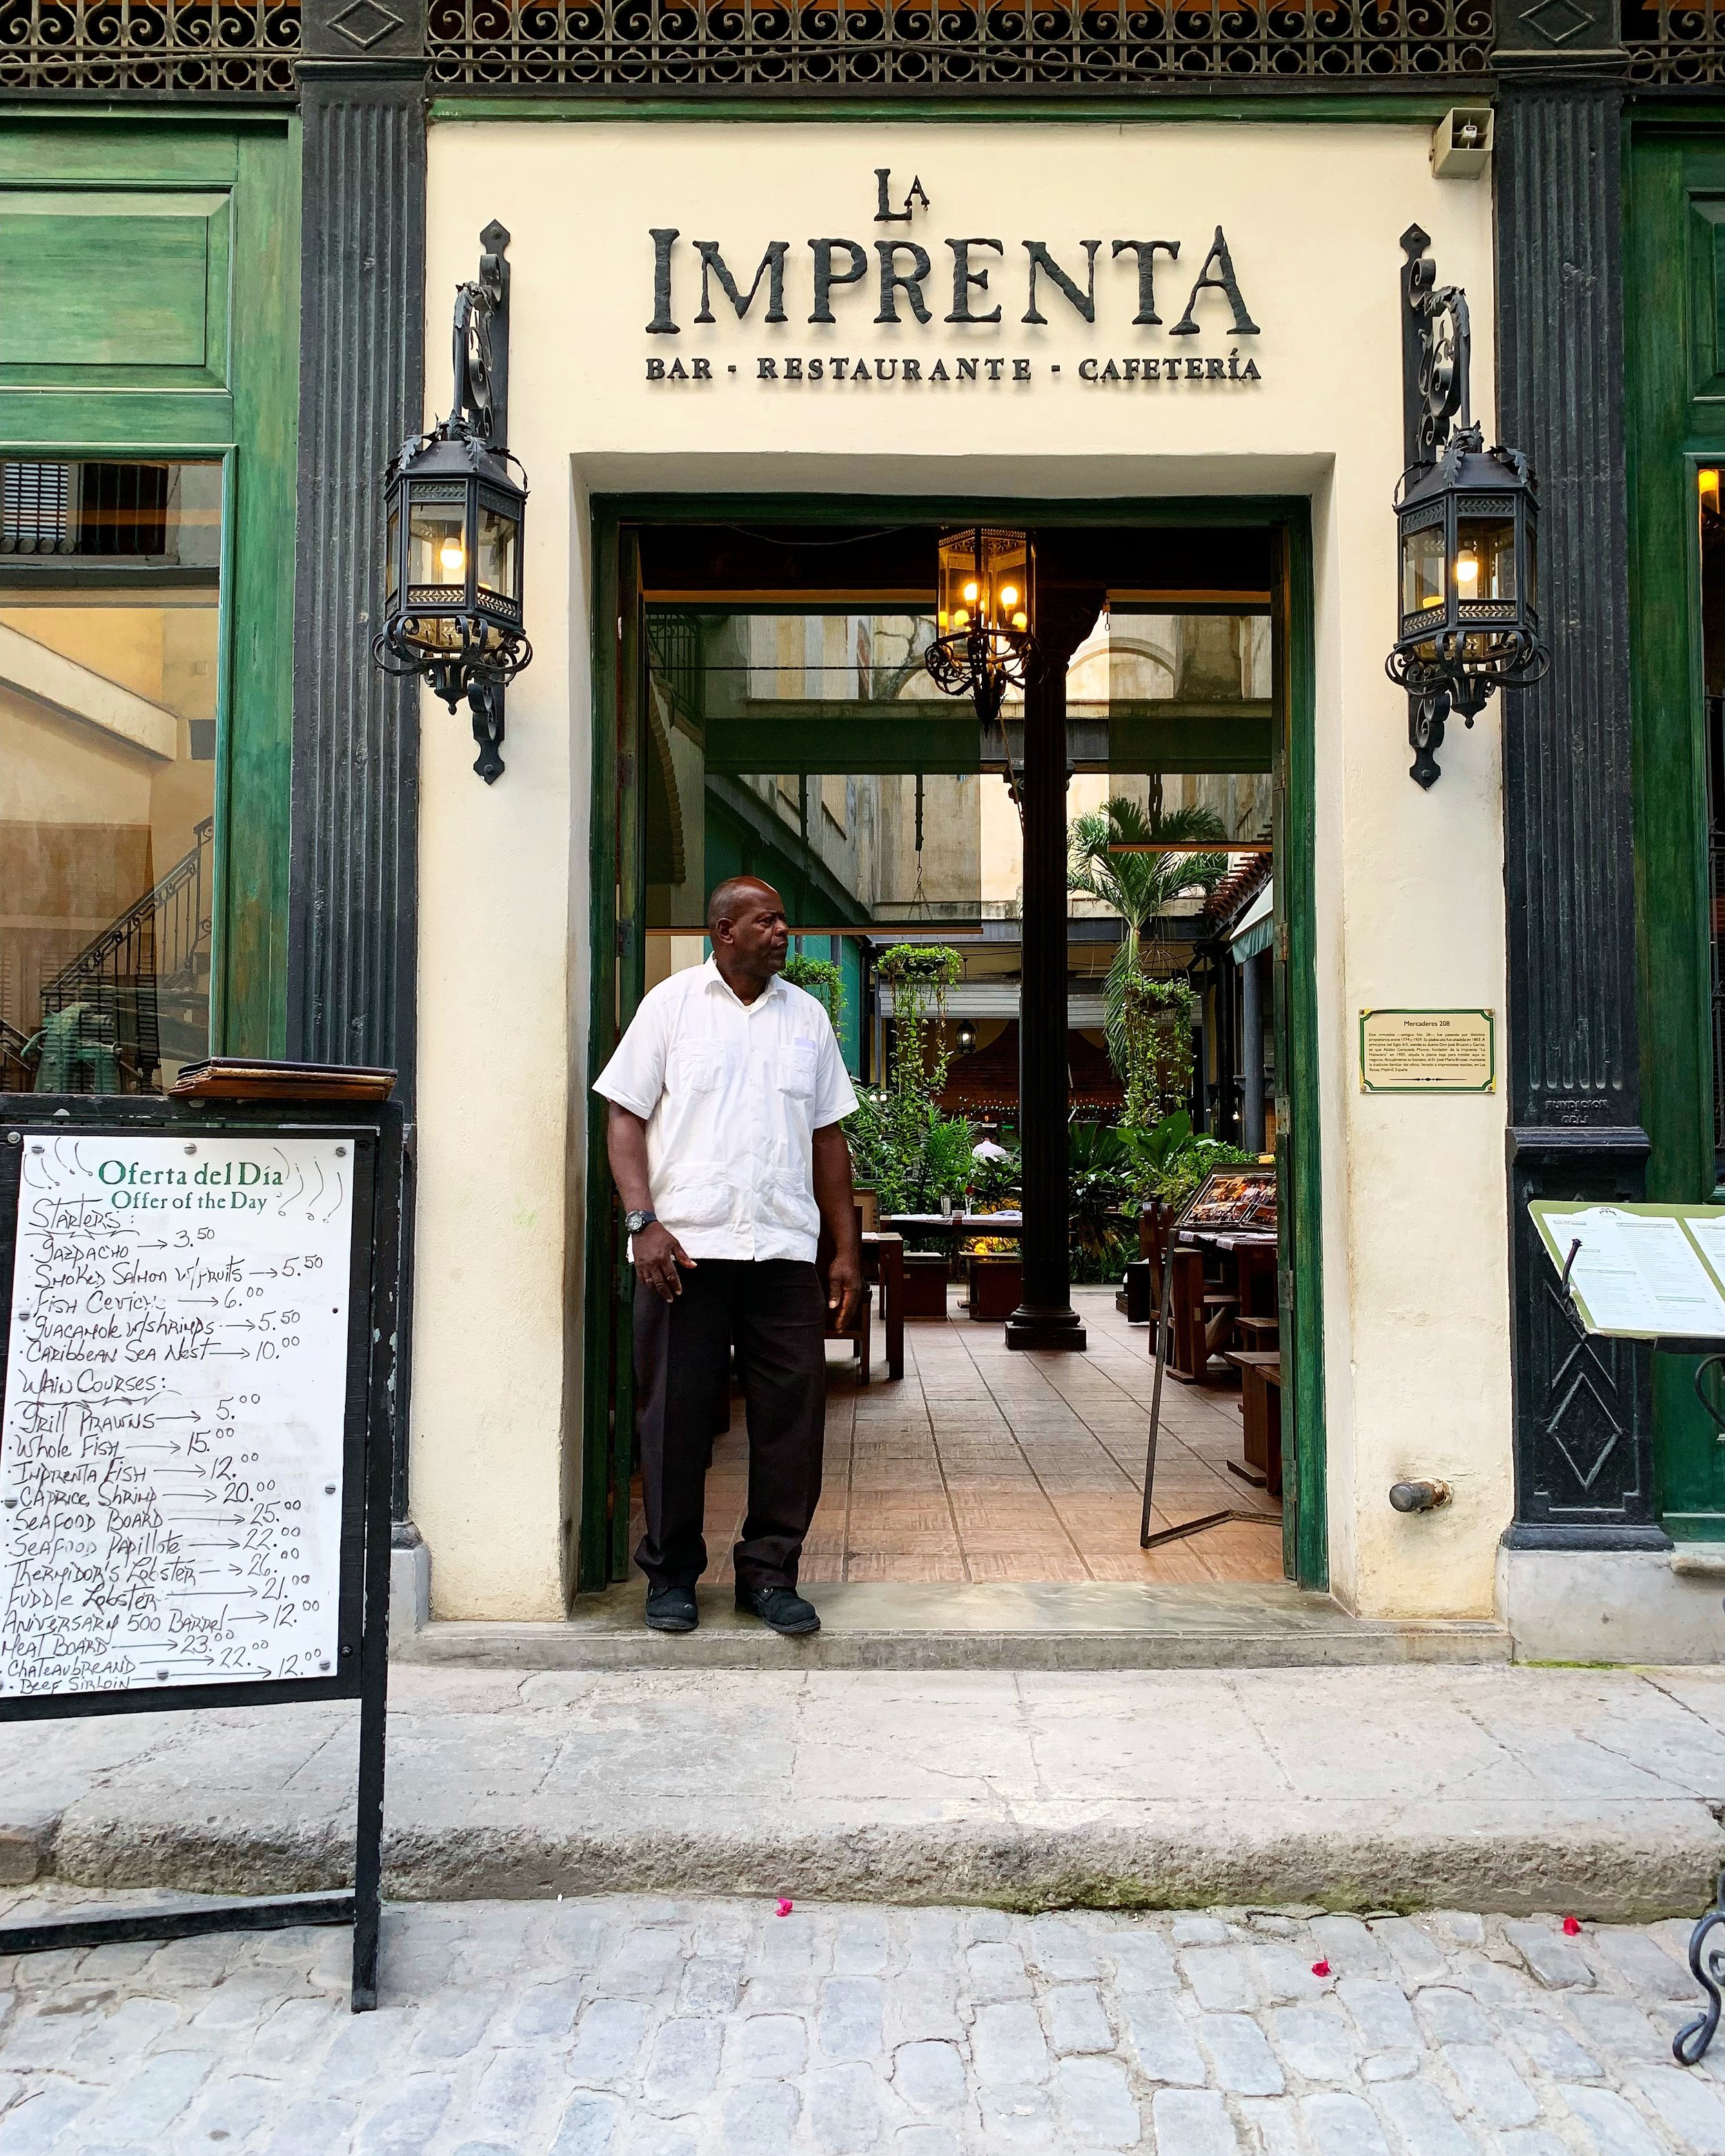 where should we eat in Havana